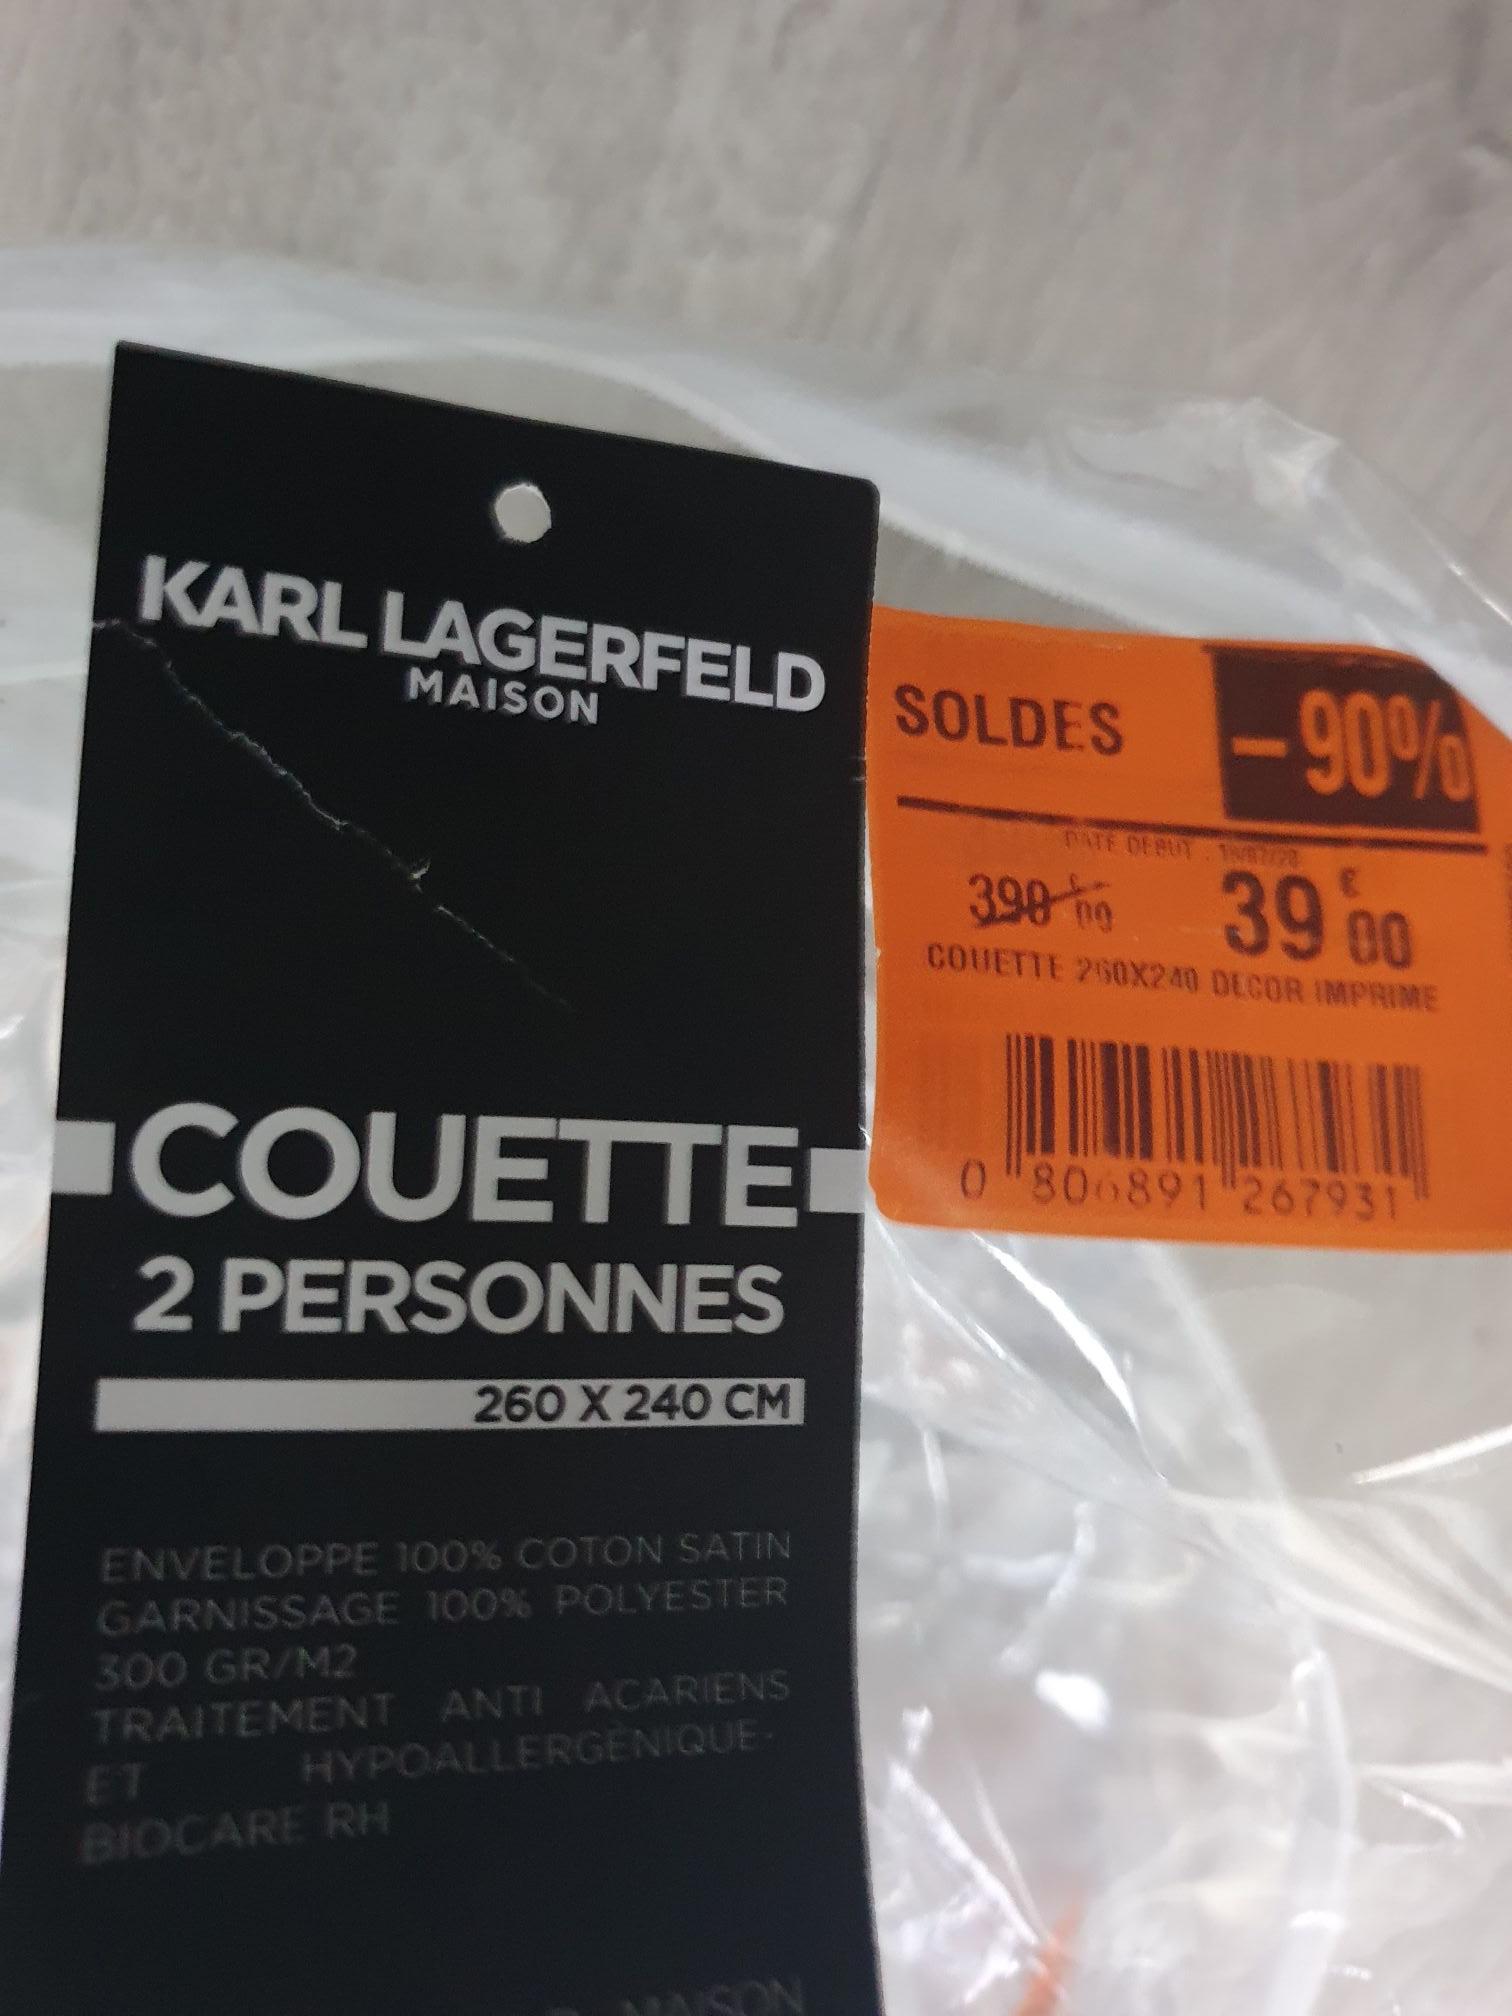 Couette 2 personnes Karl Lagerfeld (260 x 240 cm) - Colomiers (31)